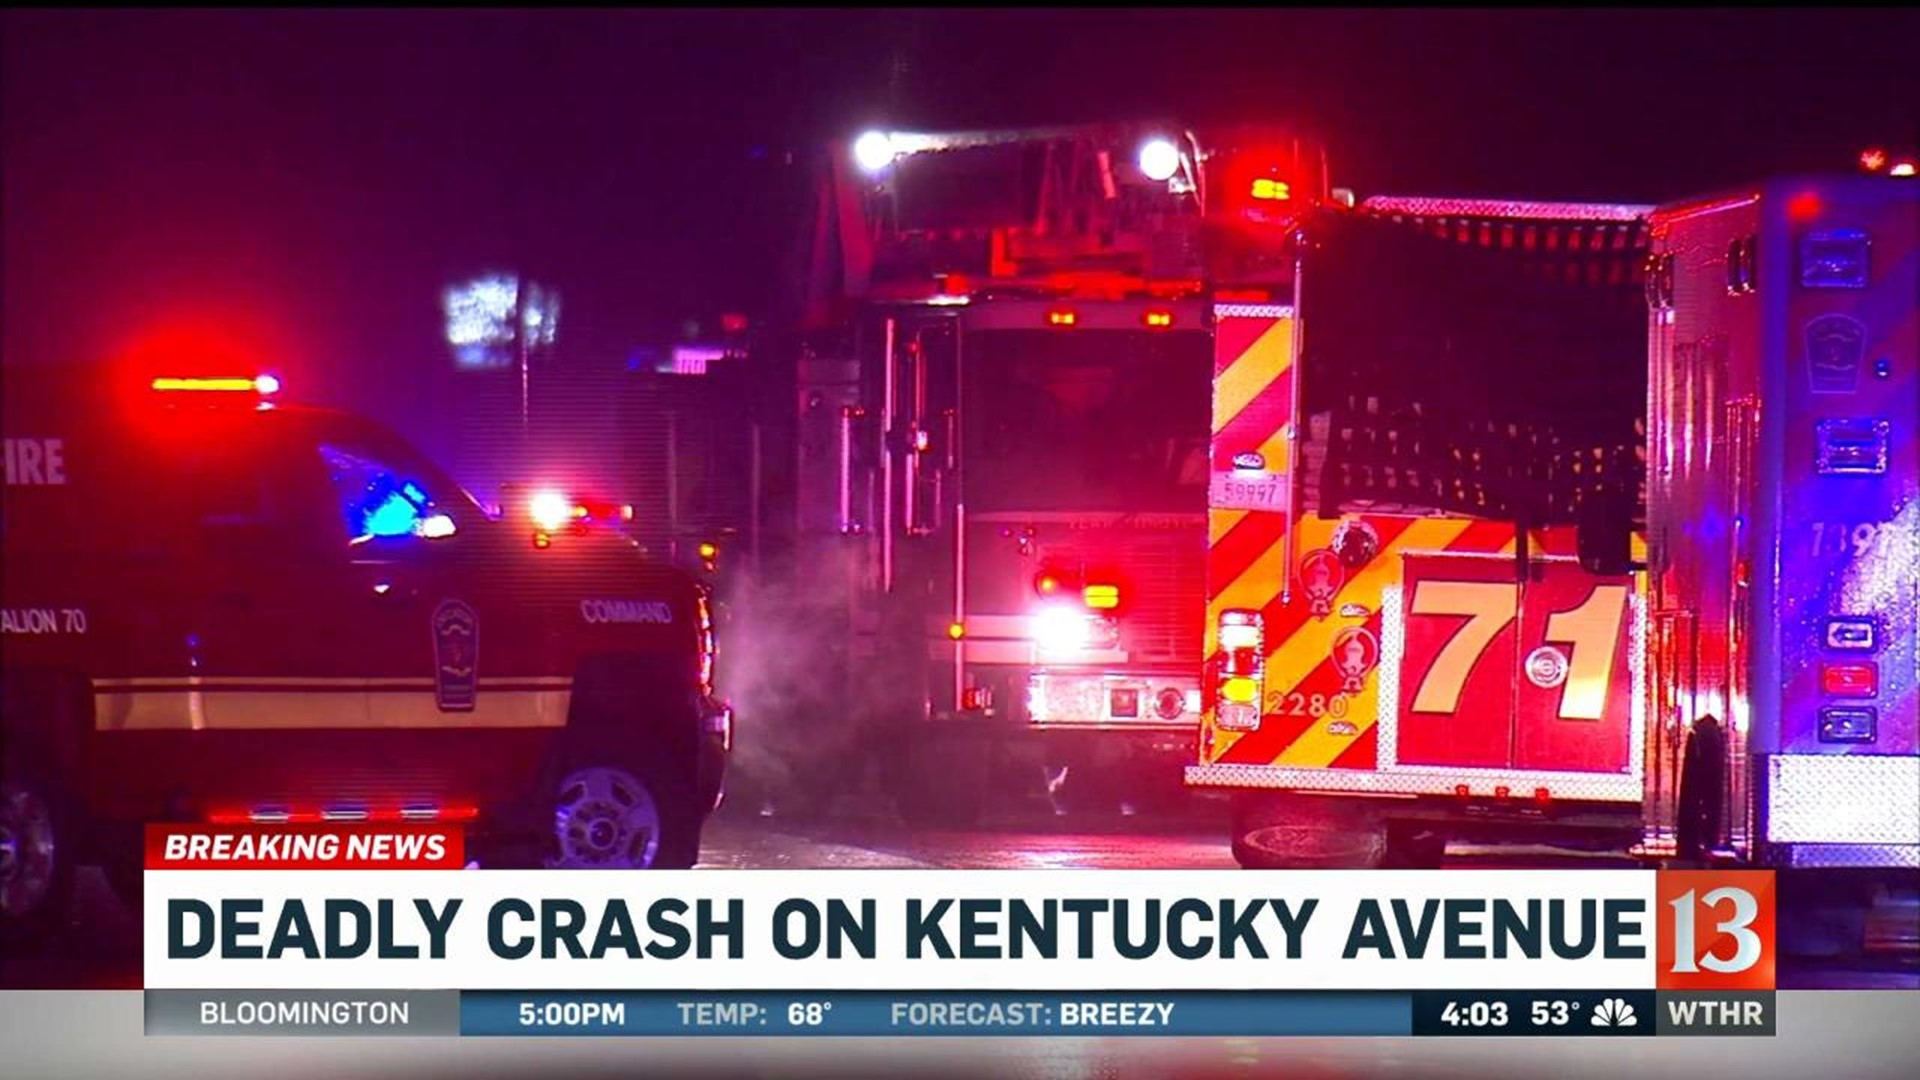 Police investigate fatal crash on Kentucky Avenue | wthr.com